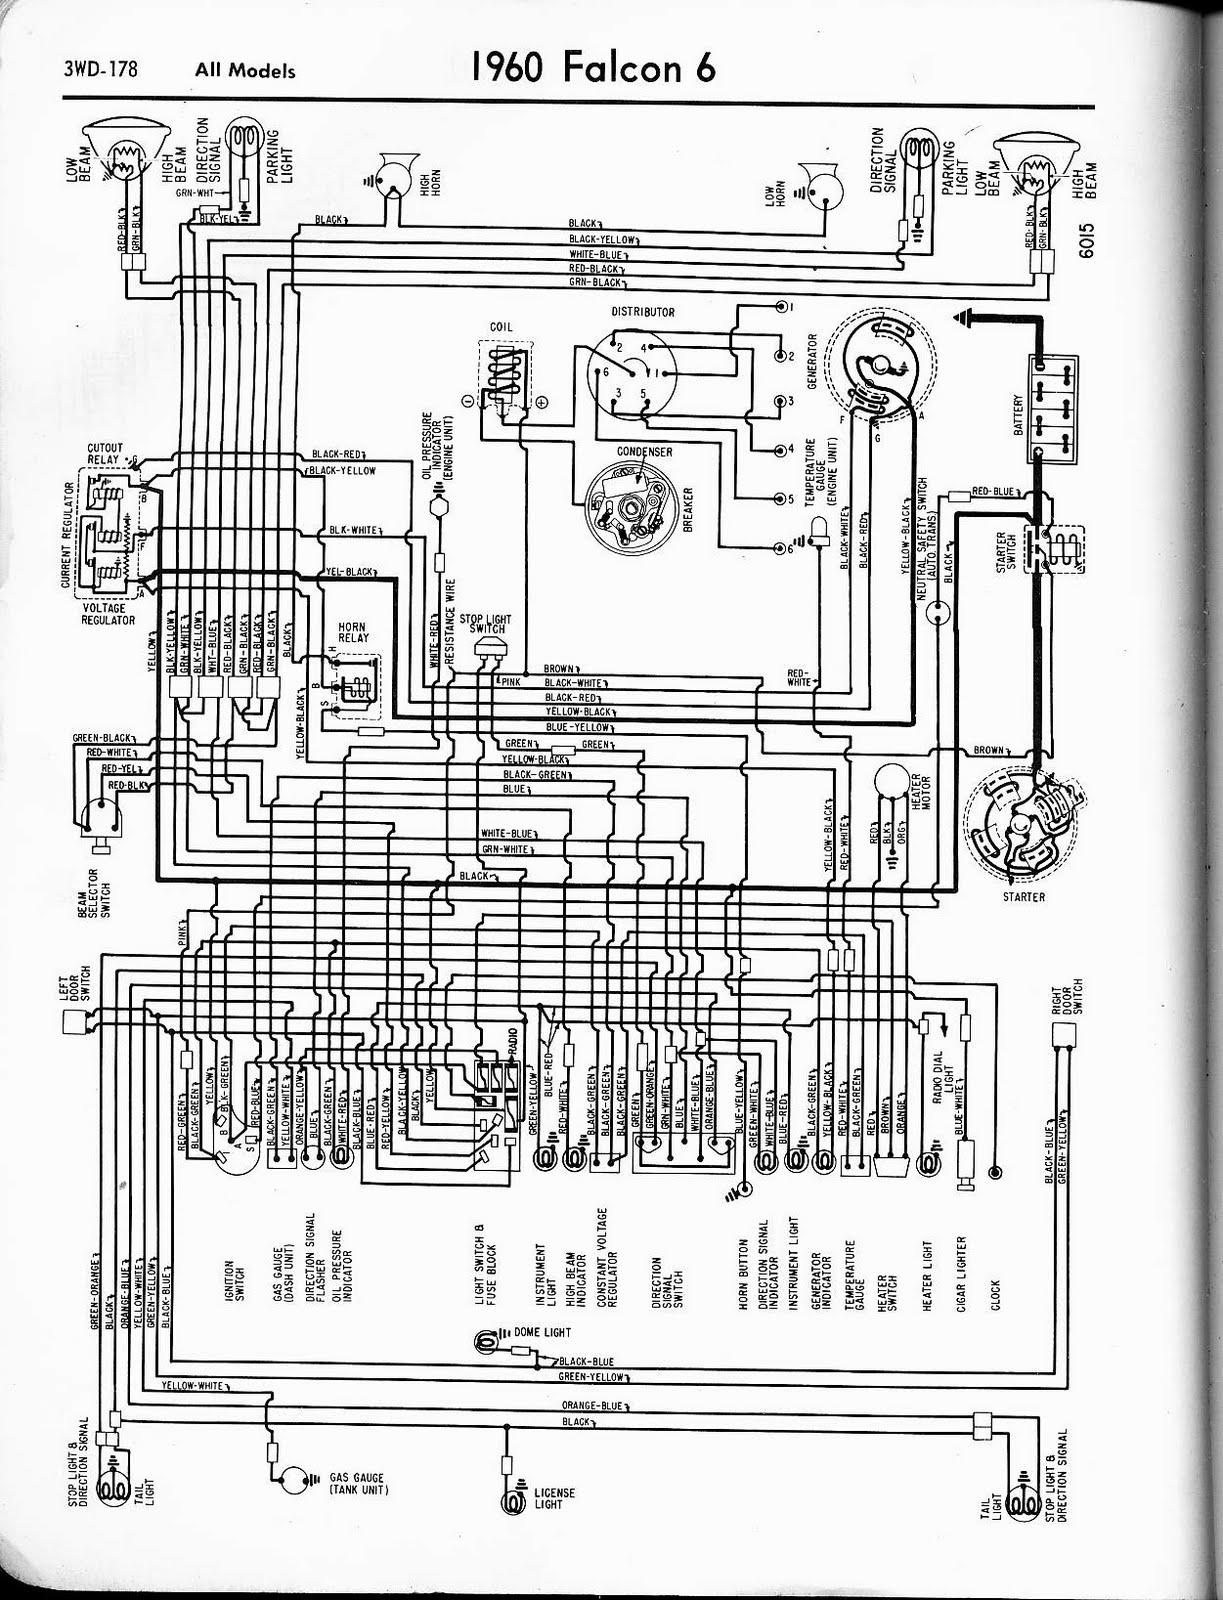 Free Auto Wiring Diagram: 1960 Ford Falcon V6 Wiring